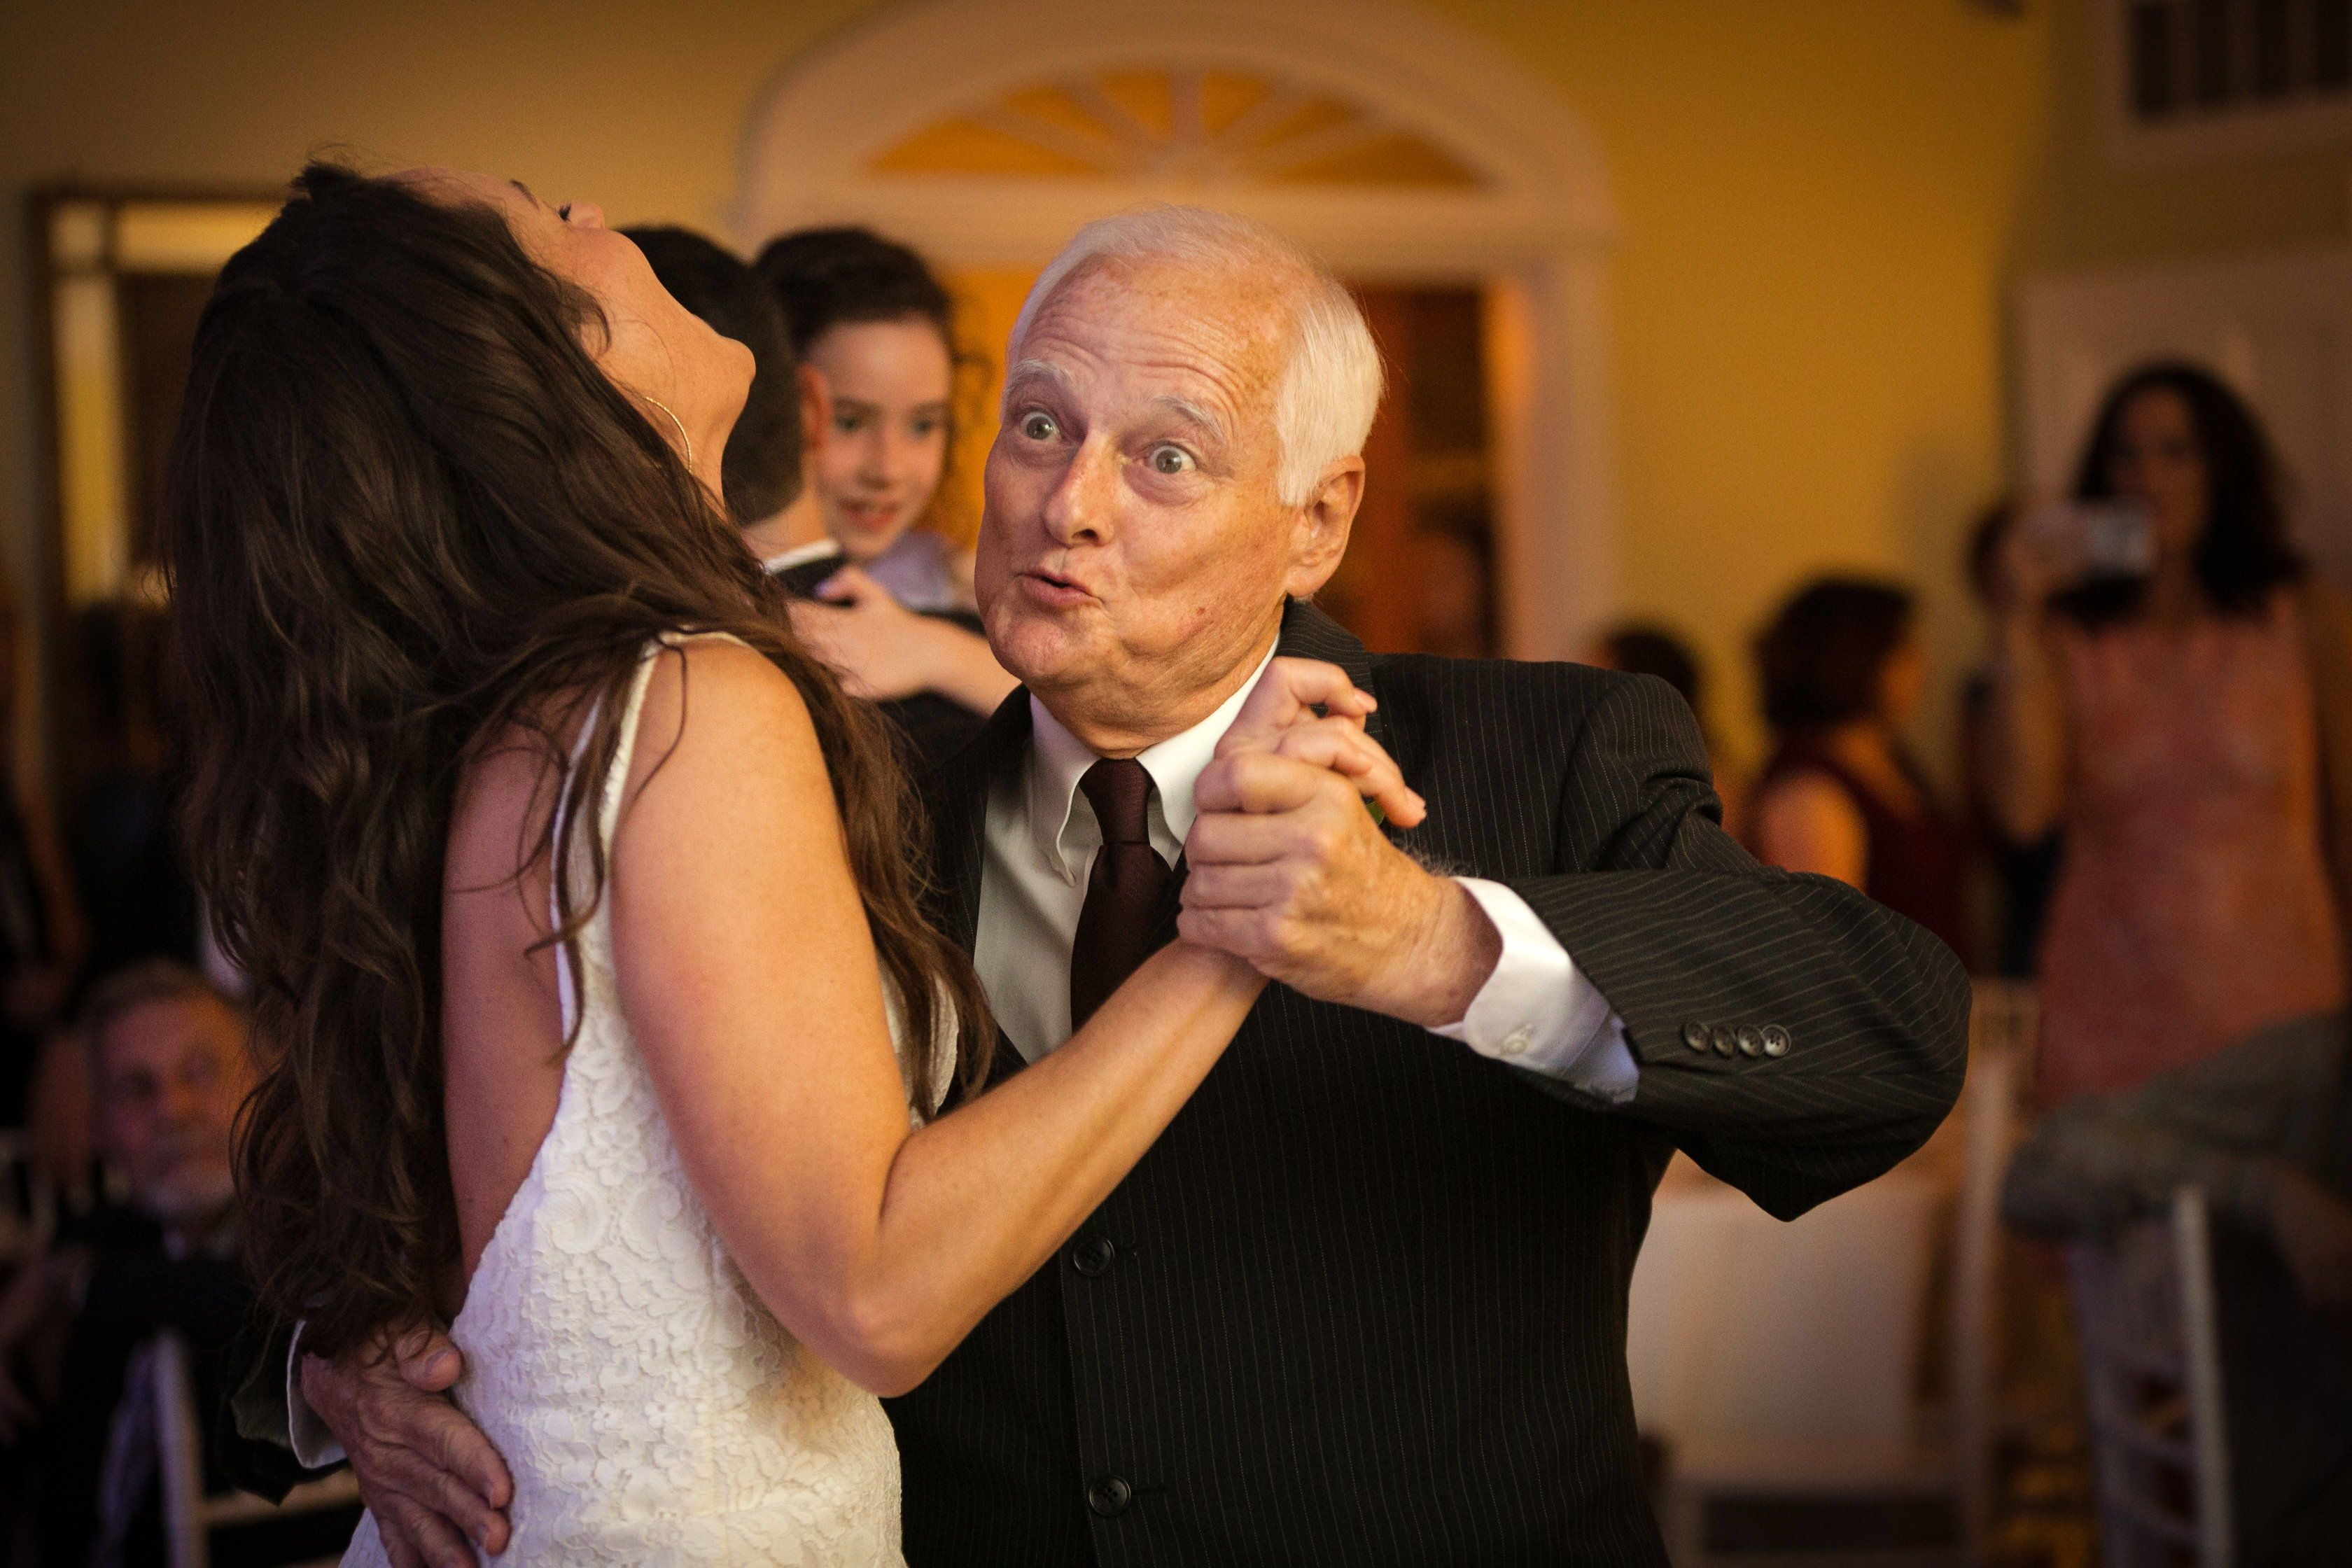 Lavender and white wedding ideas. Jacksonville wedding